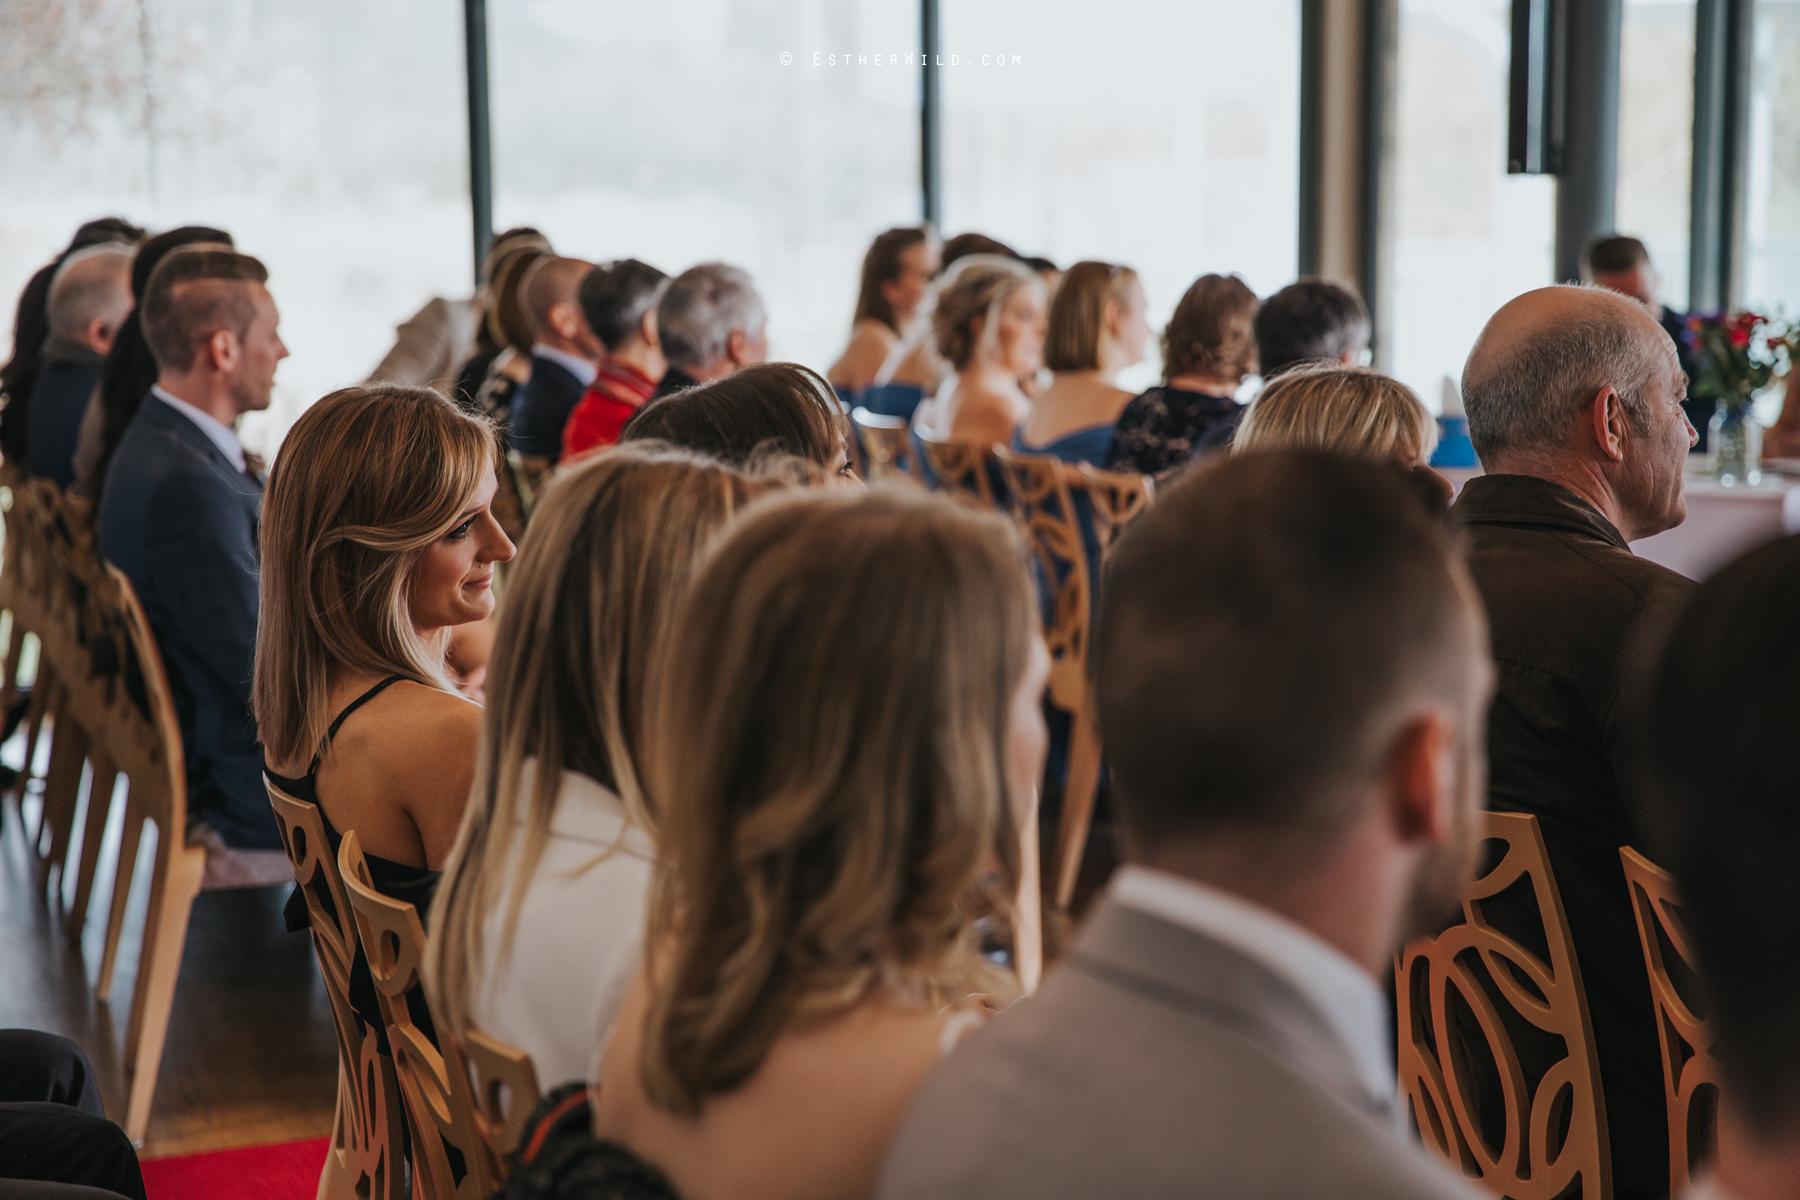 The_BoatHouse_Wedding_Venue_Ormesby_Norfolk_Broads_Boat_Wedding_Photography_Esther_Wild_Photographer_IMG_1201.jpg